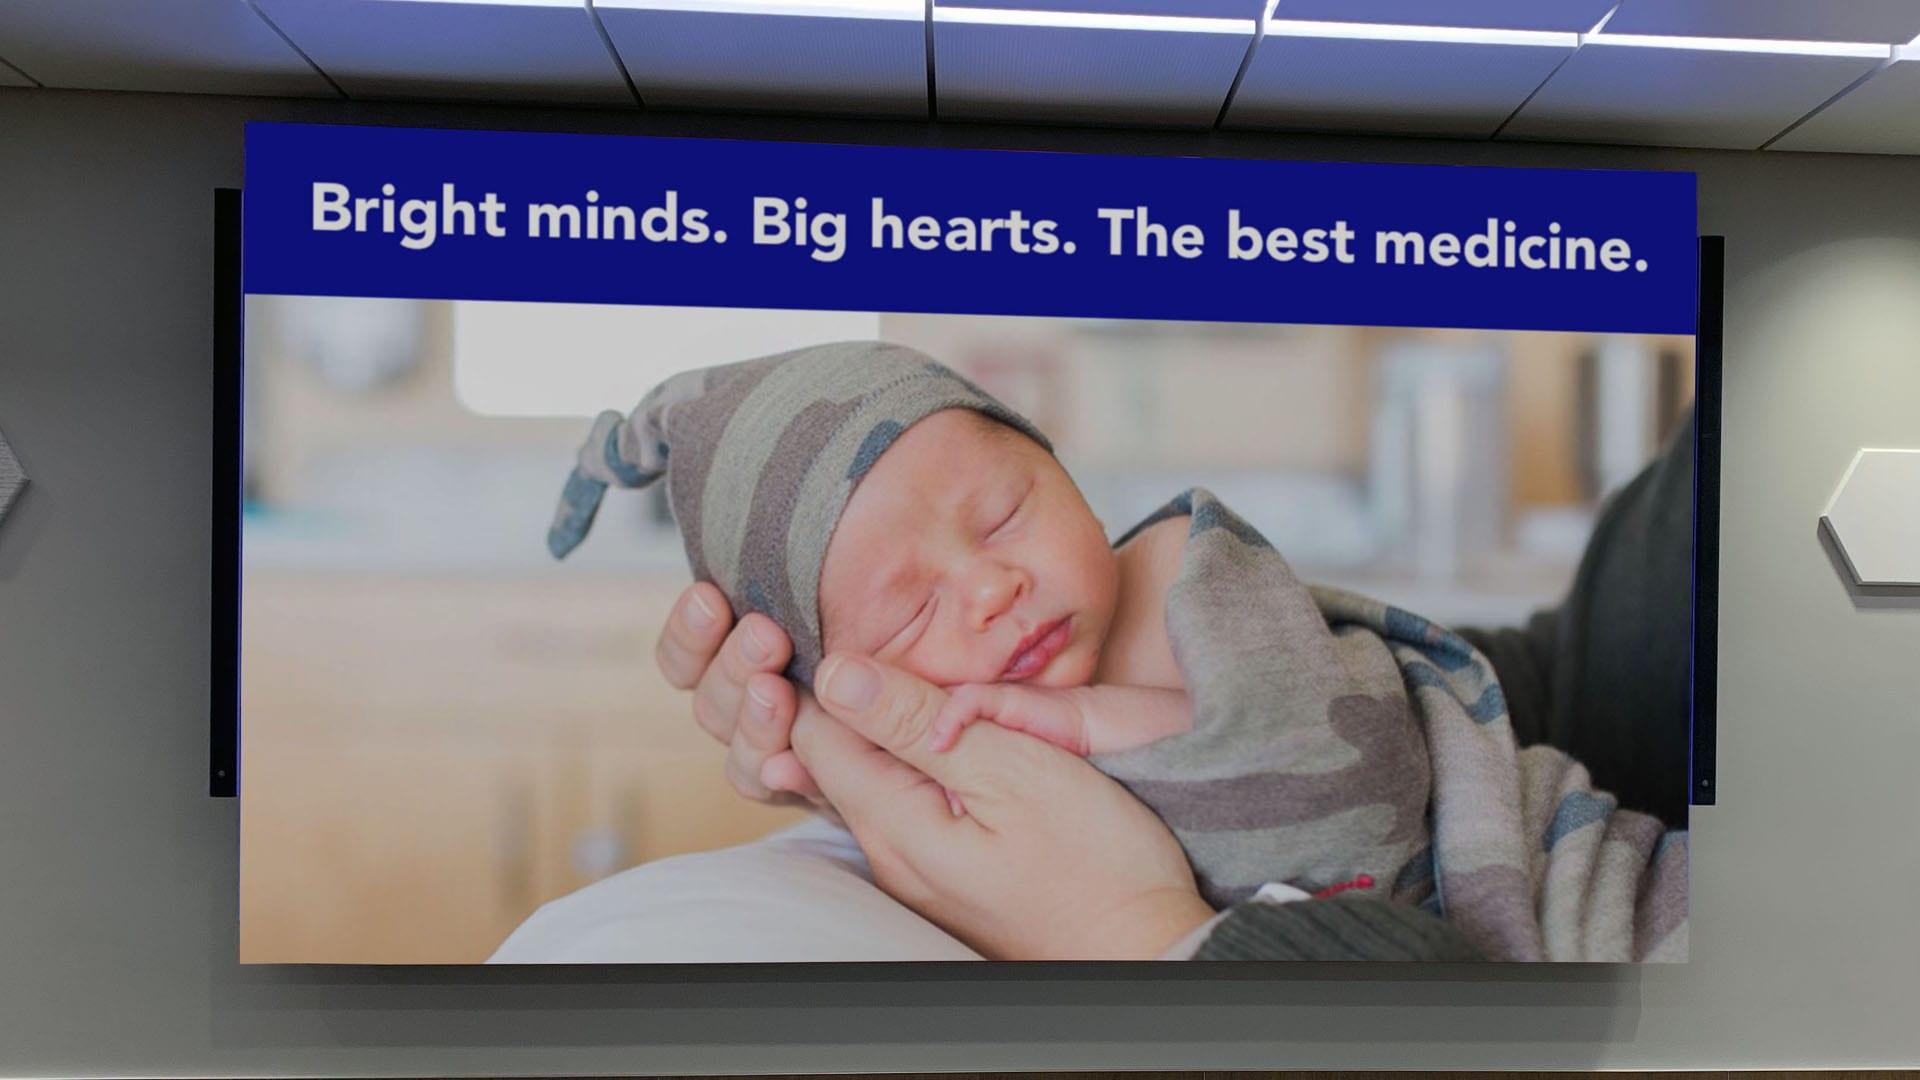 Hospital conference room LED display